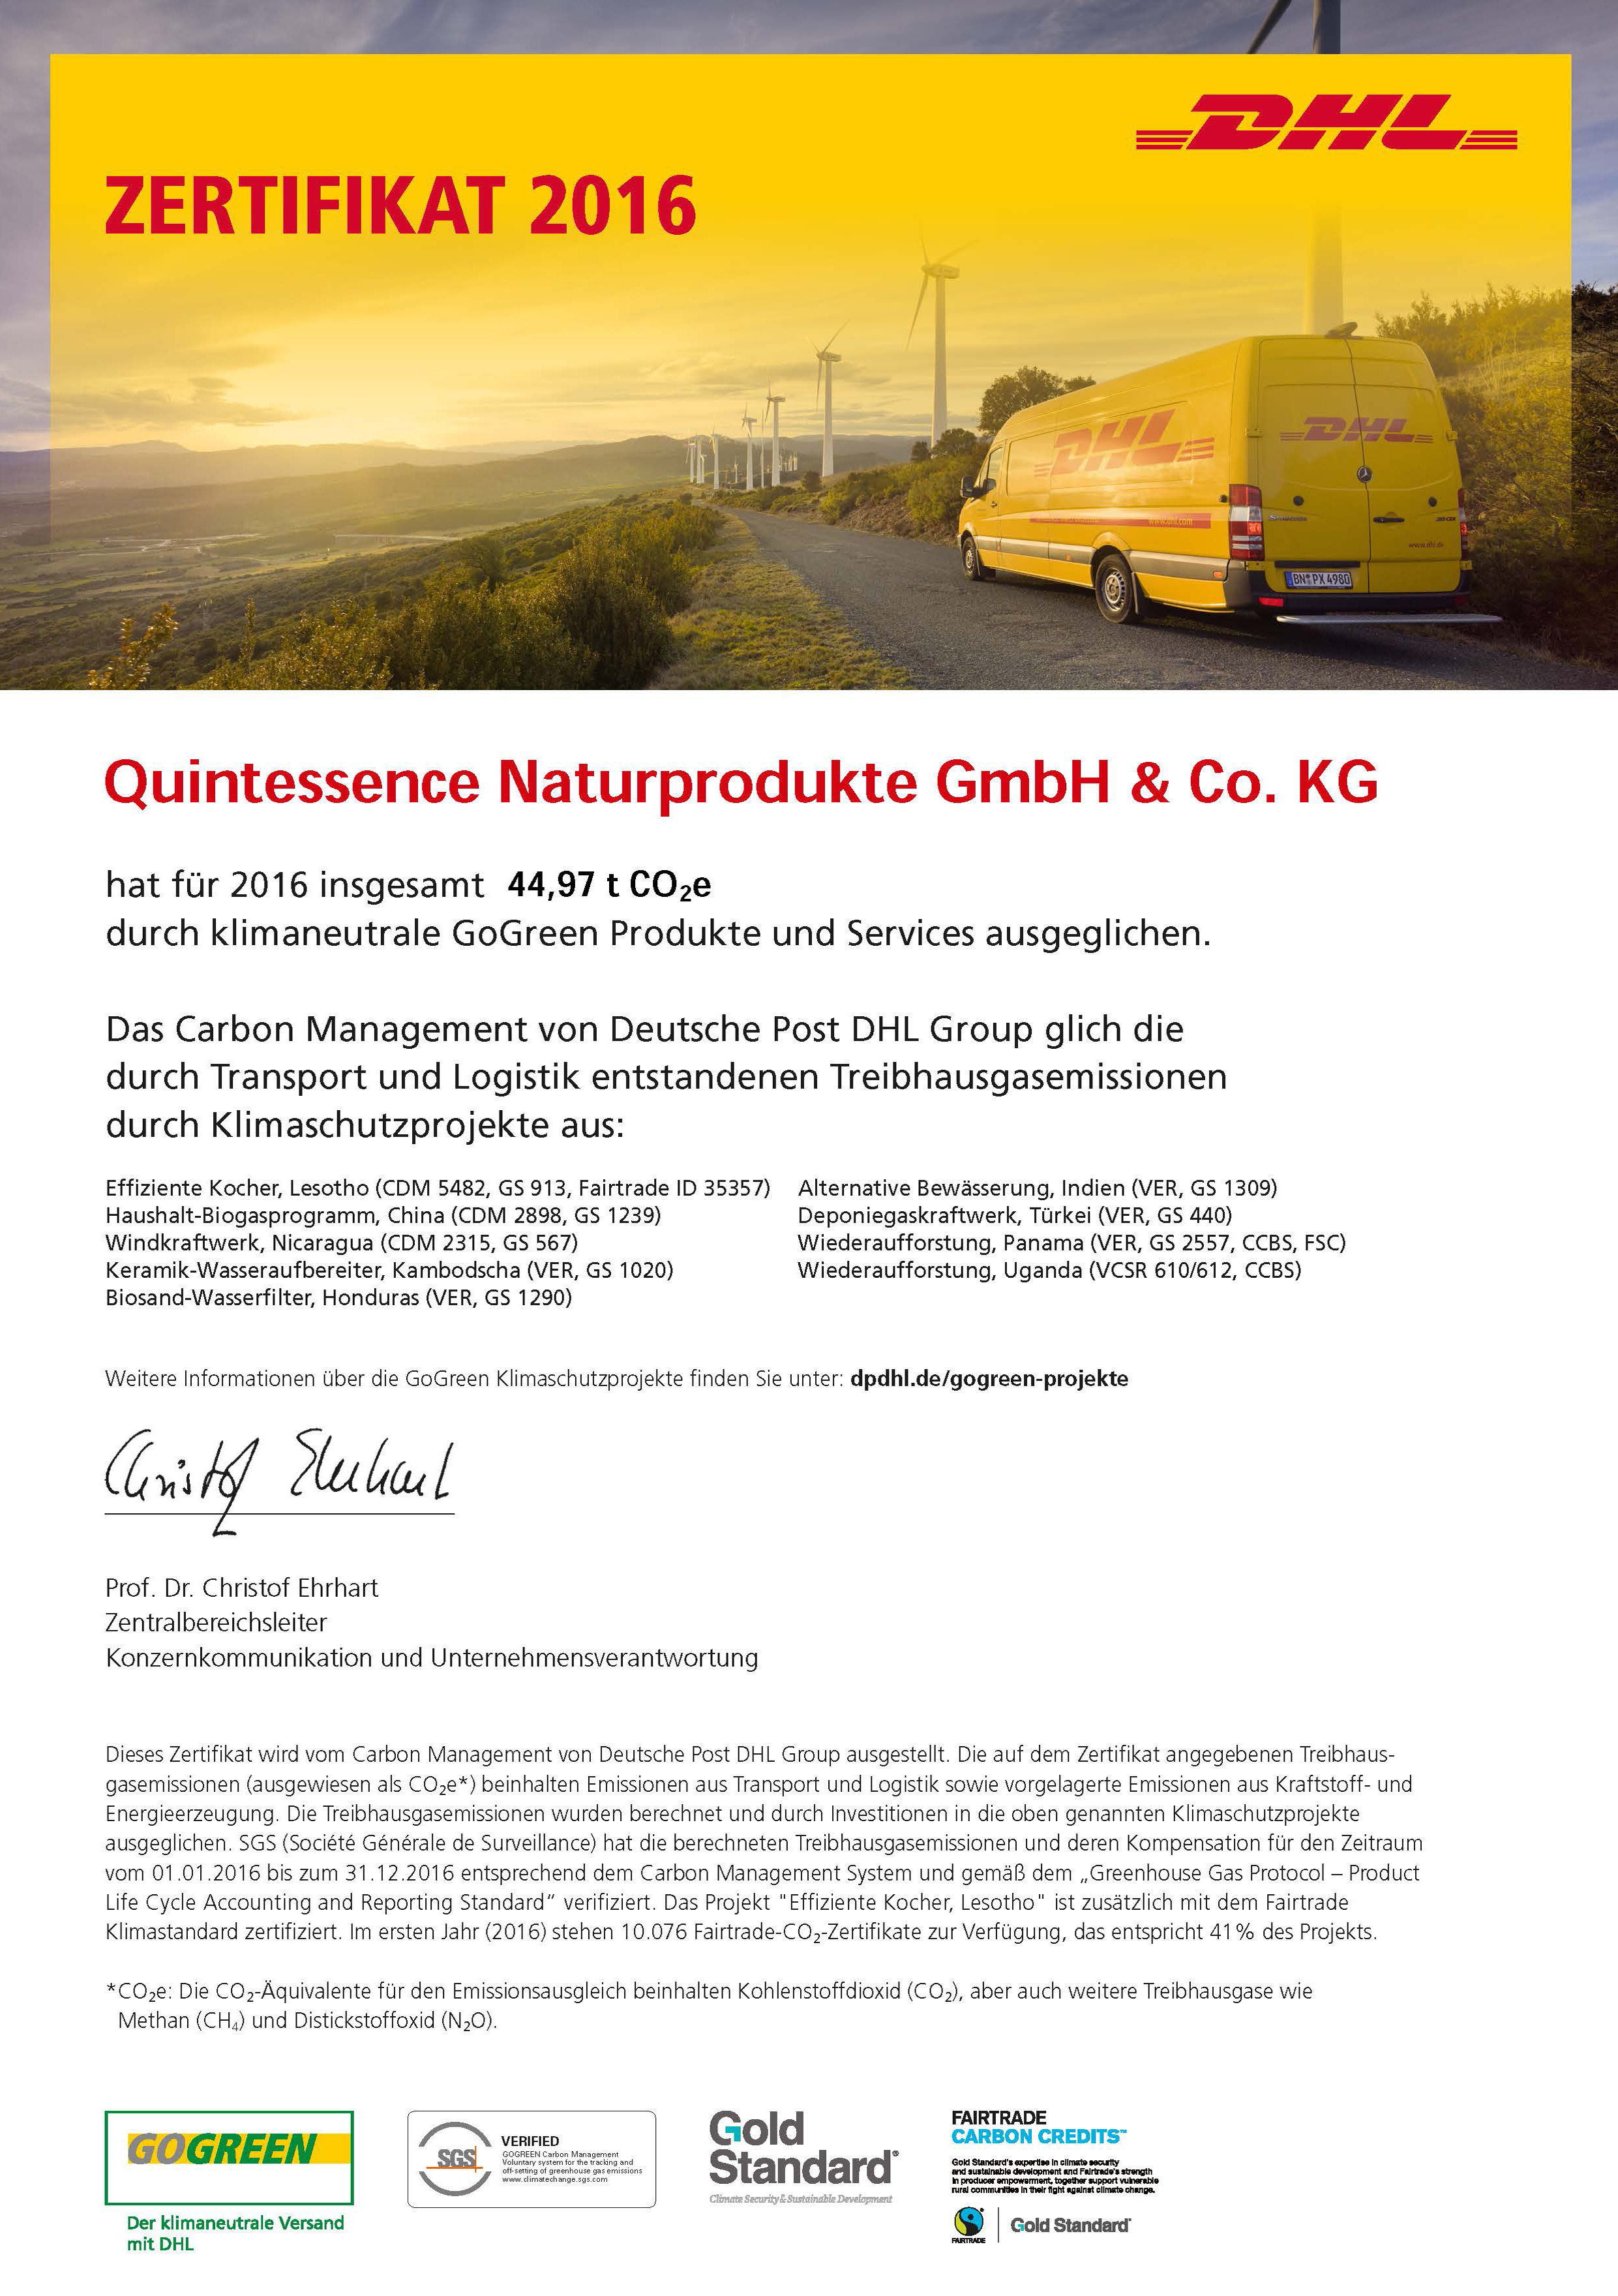 DHL-GoGreen-Zertifikat 2016